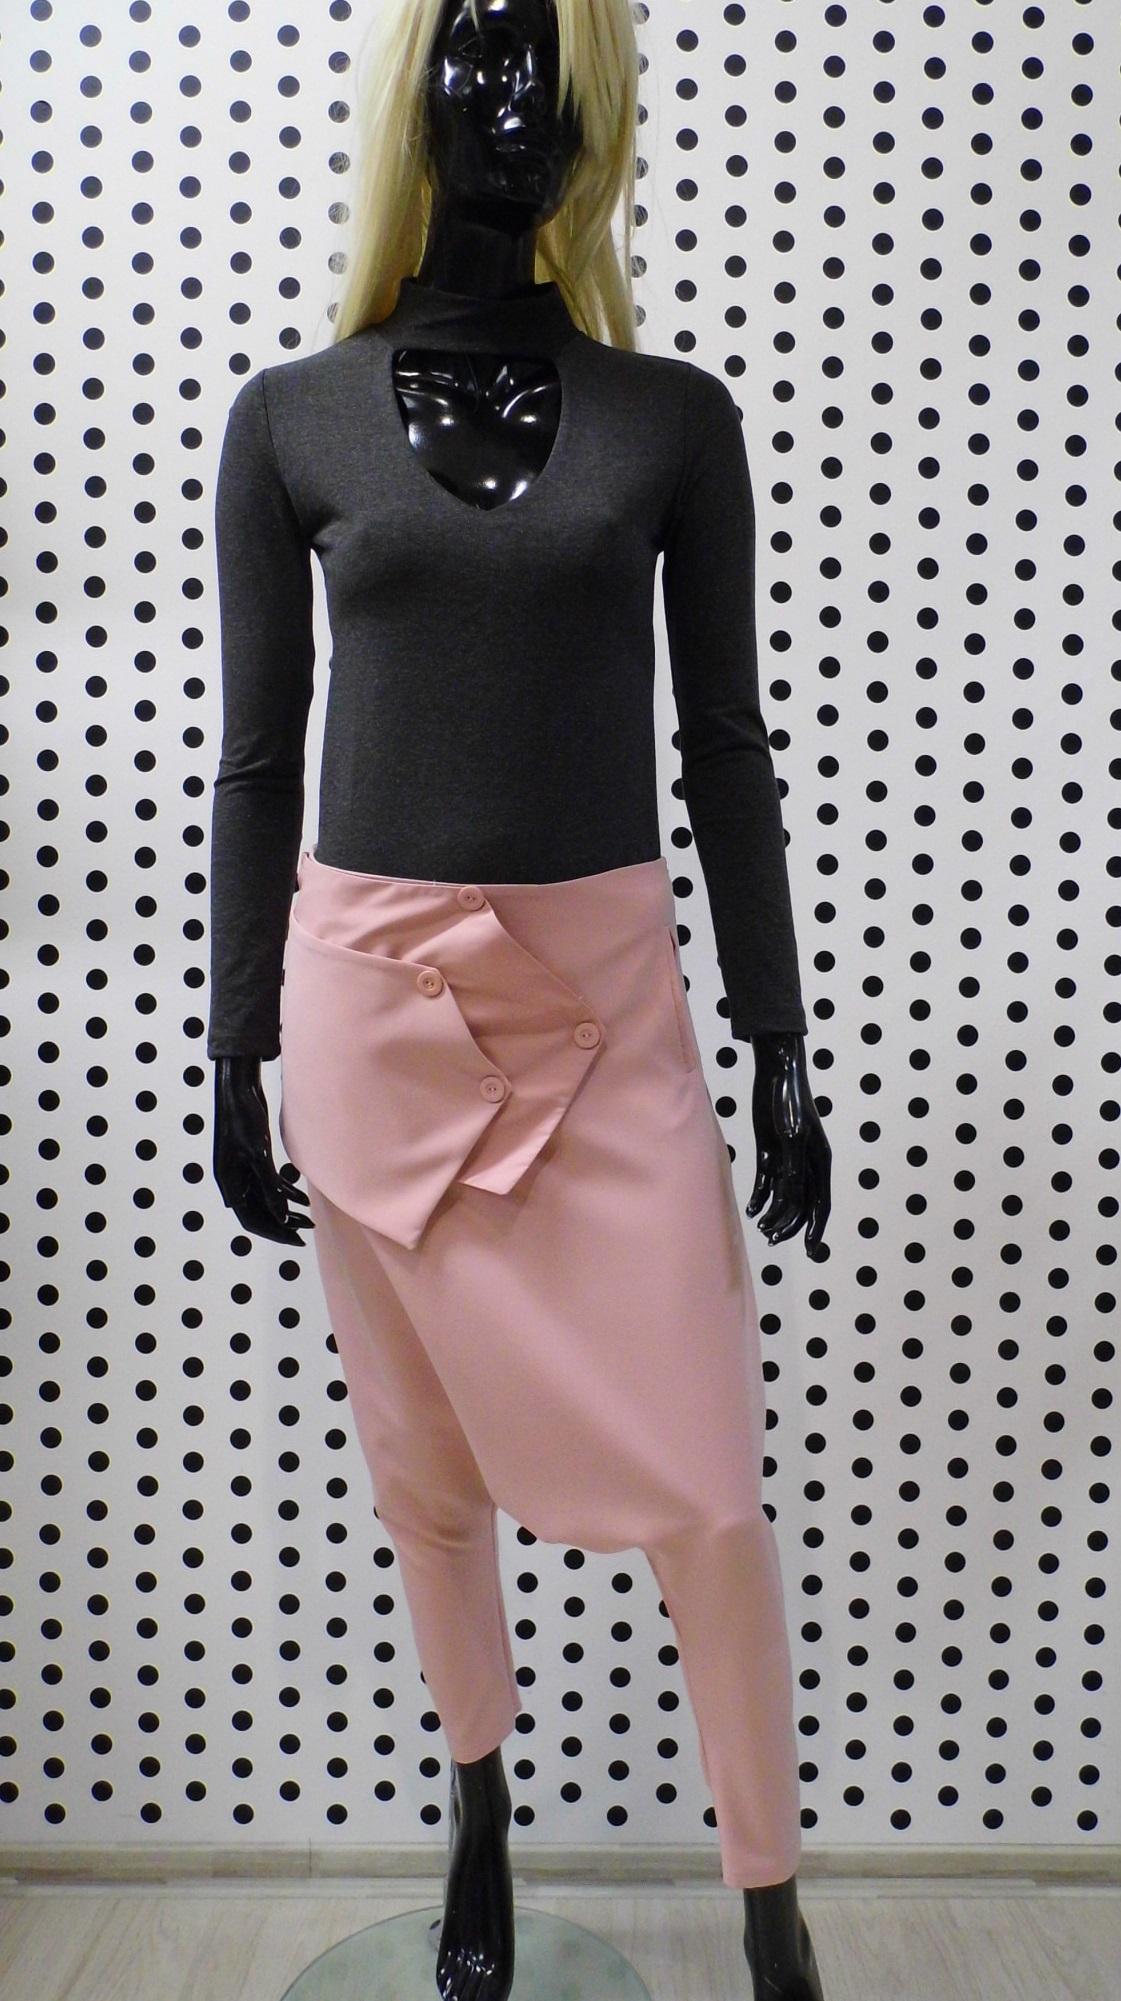 fe0e7548c388 Ružové pudlové nohavice – erlenfashion.sk